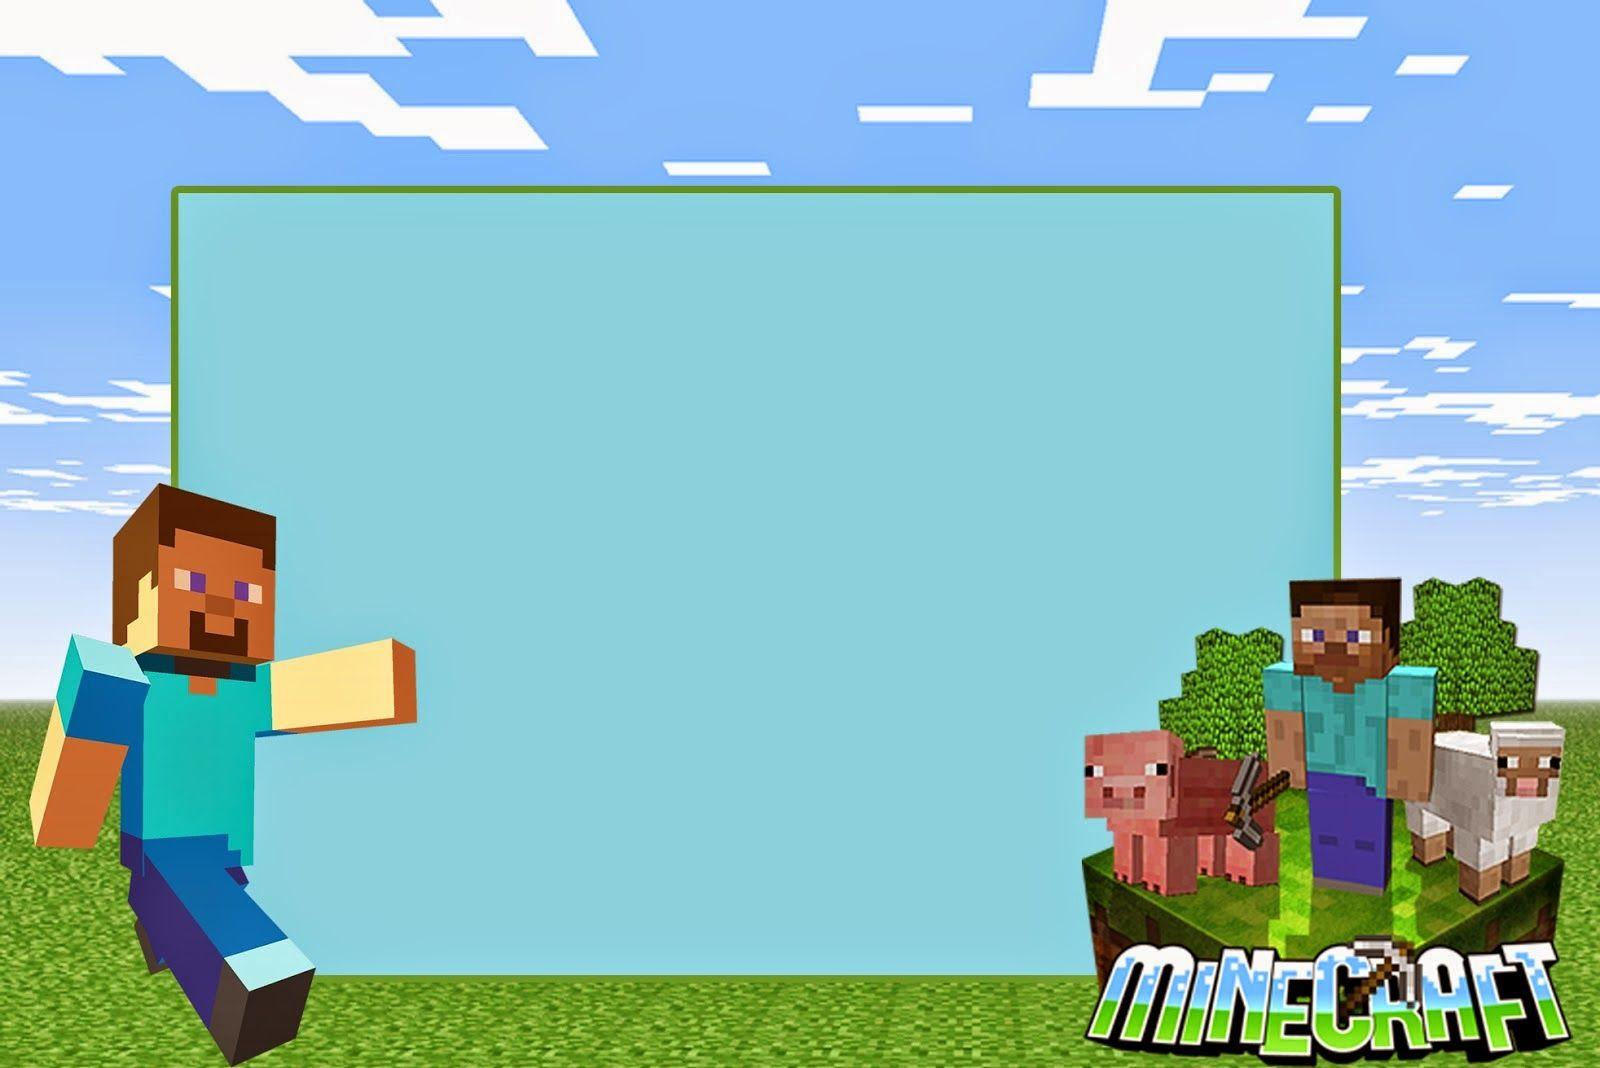 Minecraft Free Printable Invitations Party Ideas Pinterest - Video game birthday invitation template